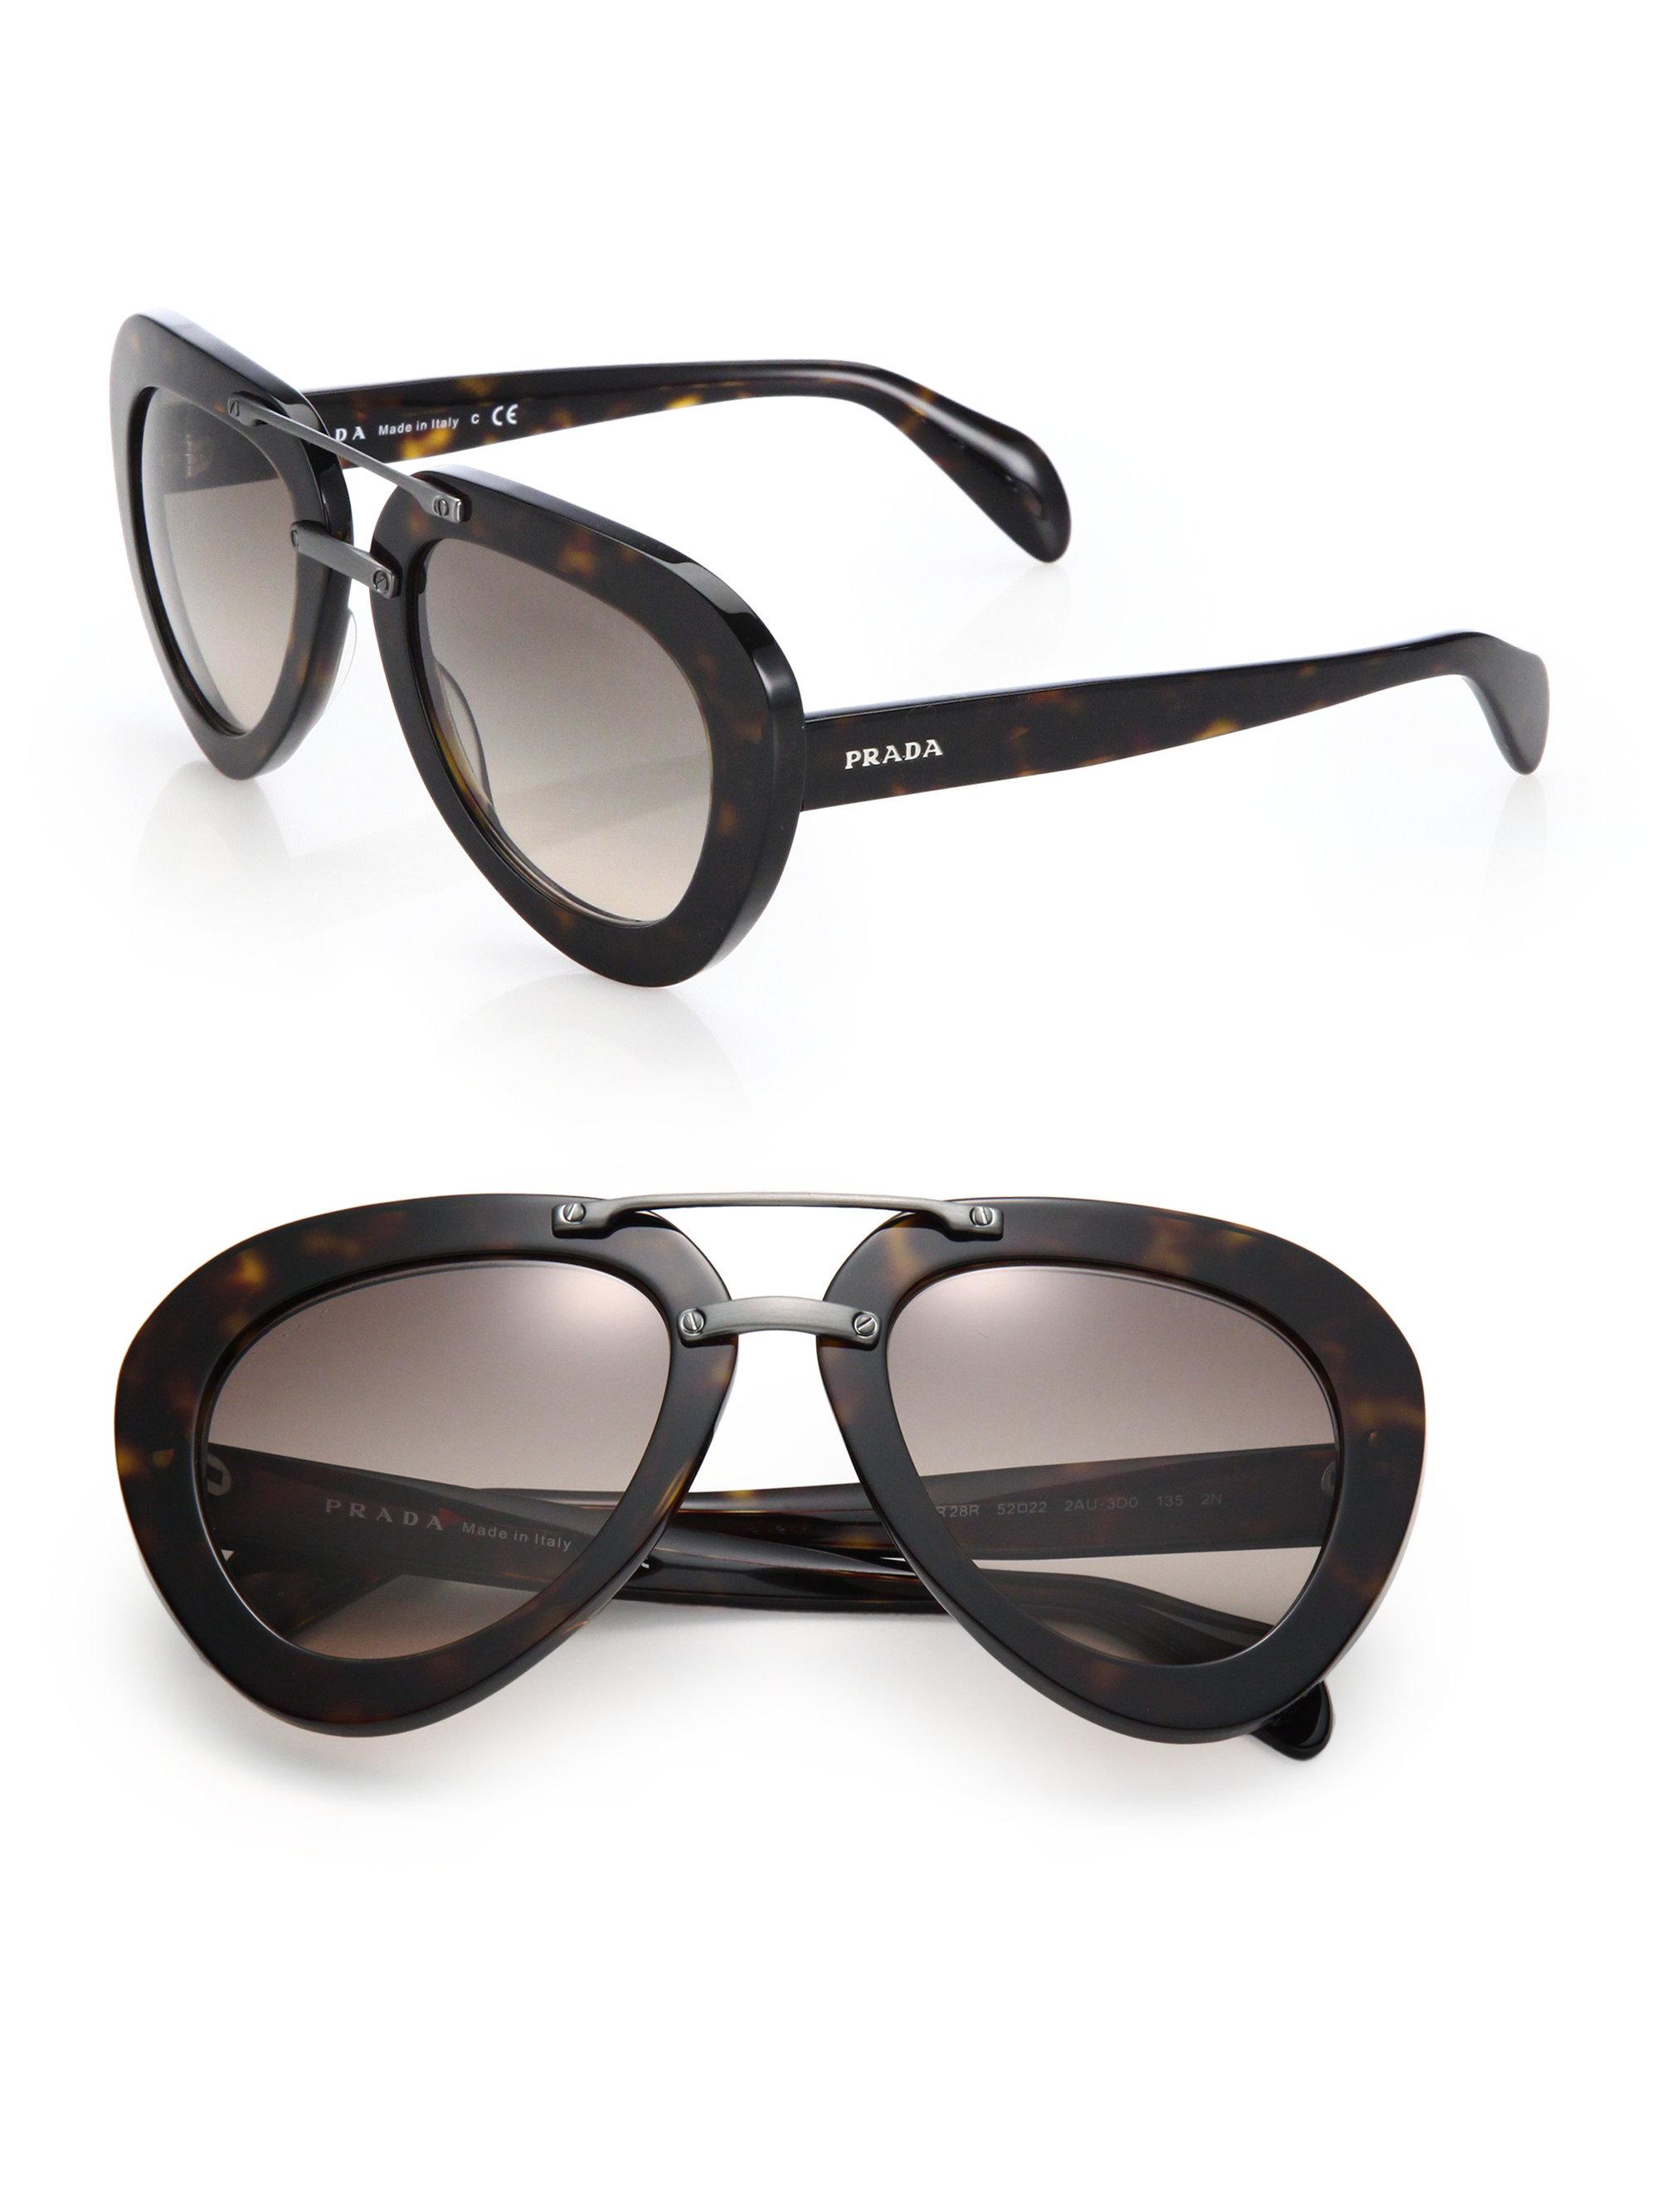 e355d465e45bd ... france lyst prada 52mm pilot sunglasses in black 3750b 107e1